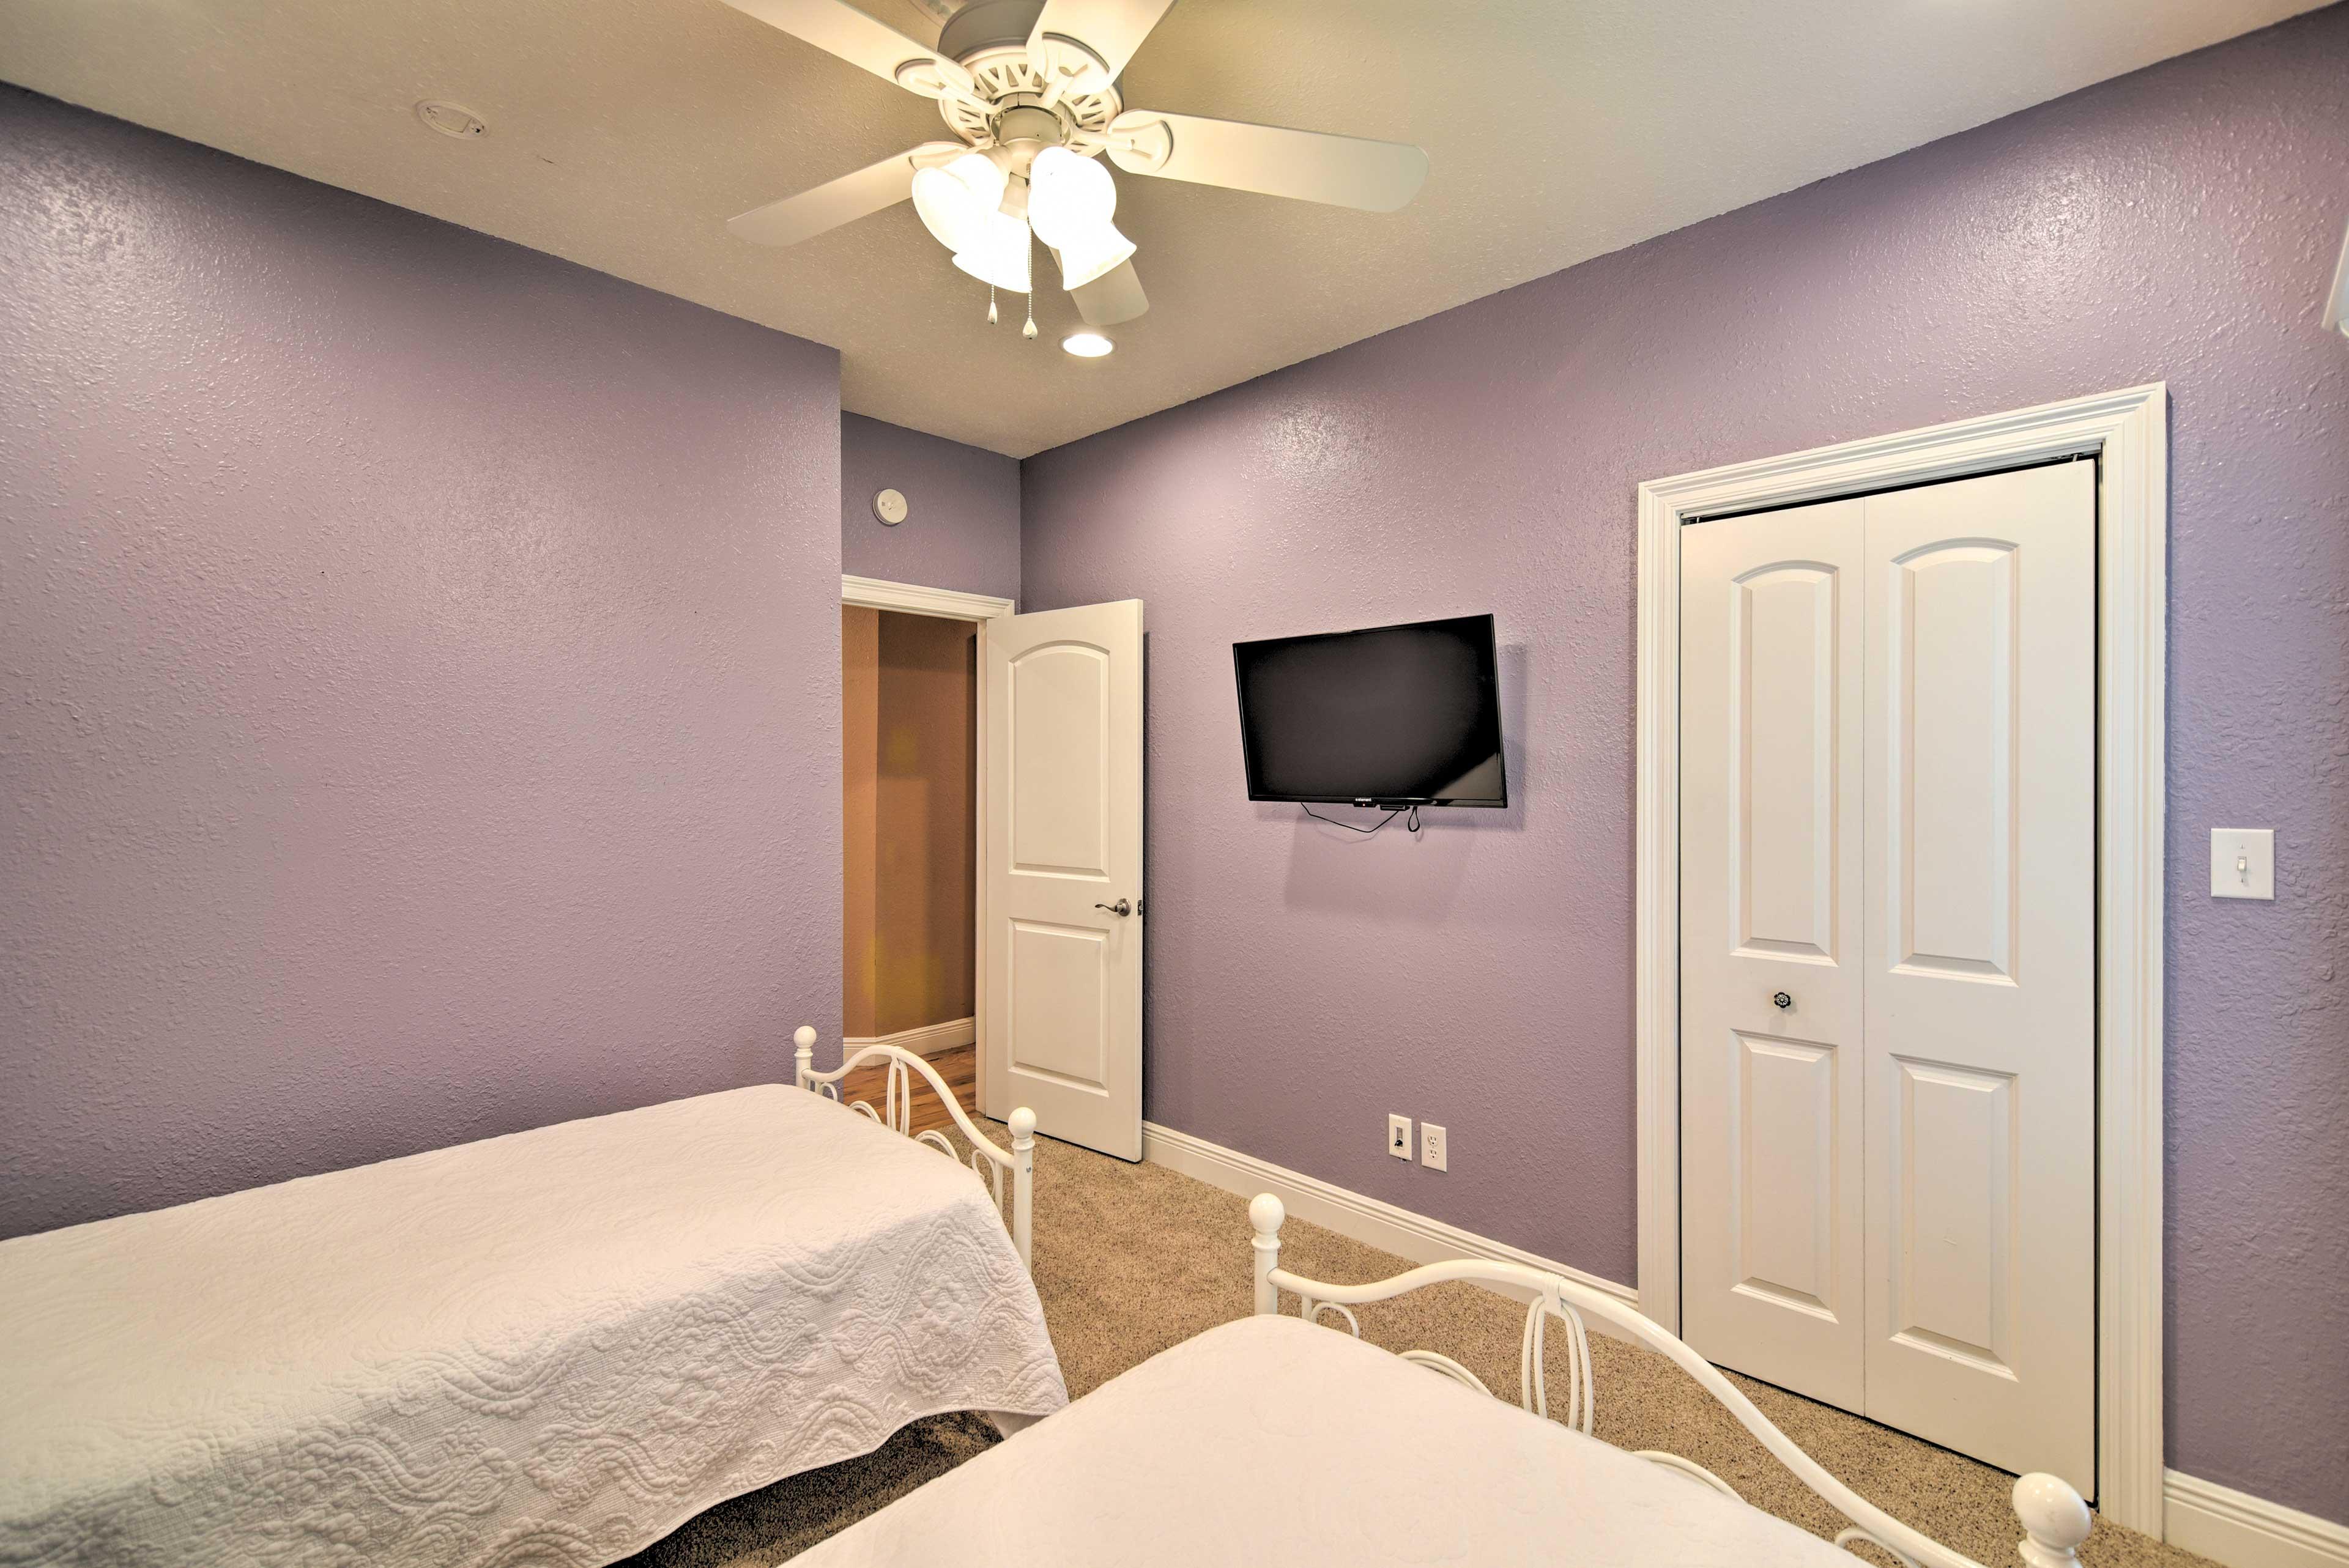 Each room has a flat-screen TV.